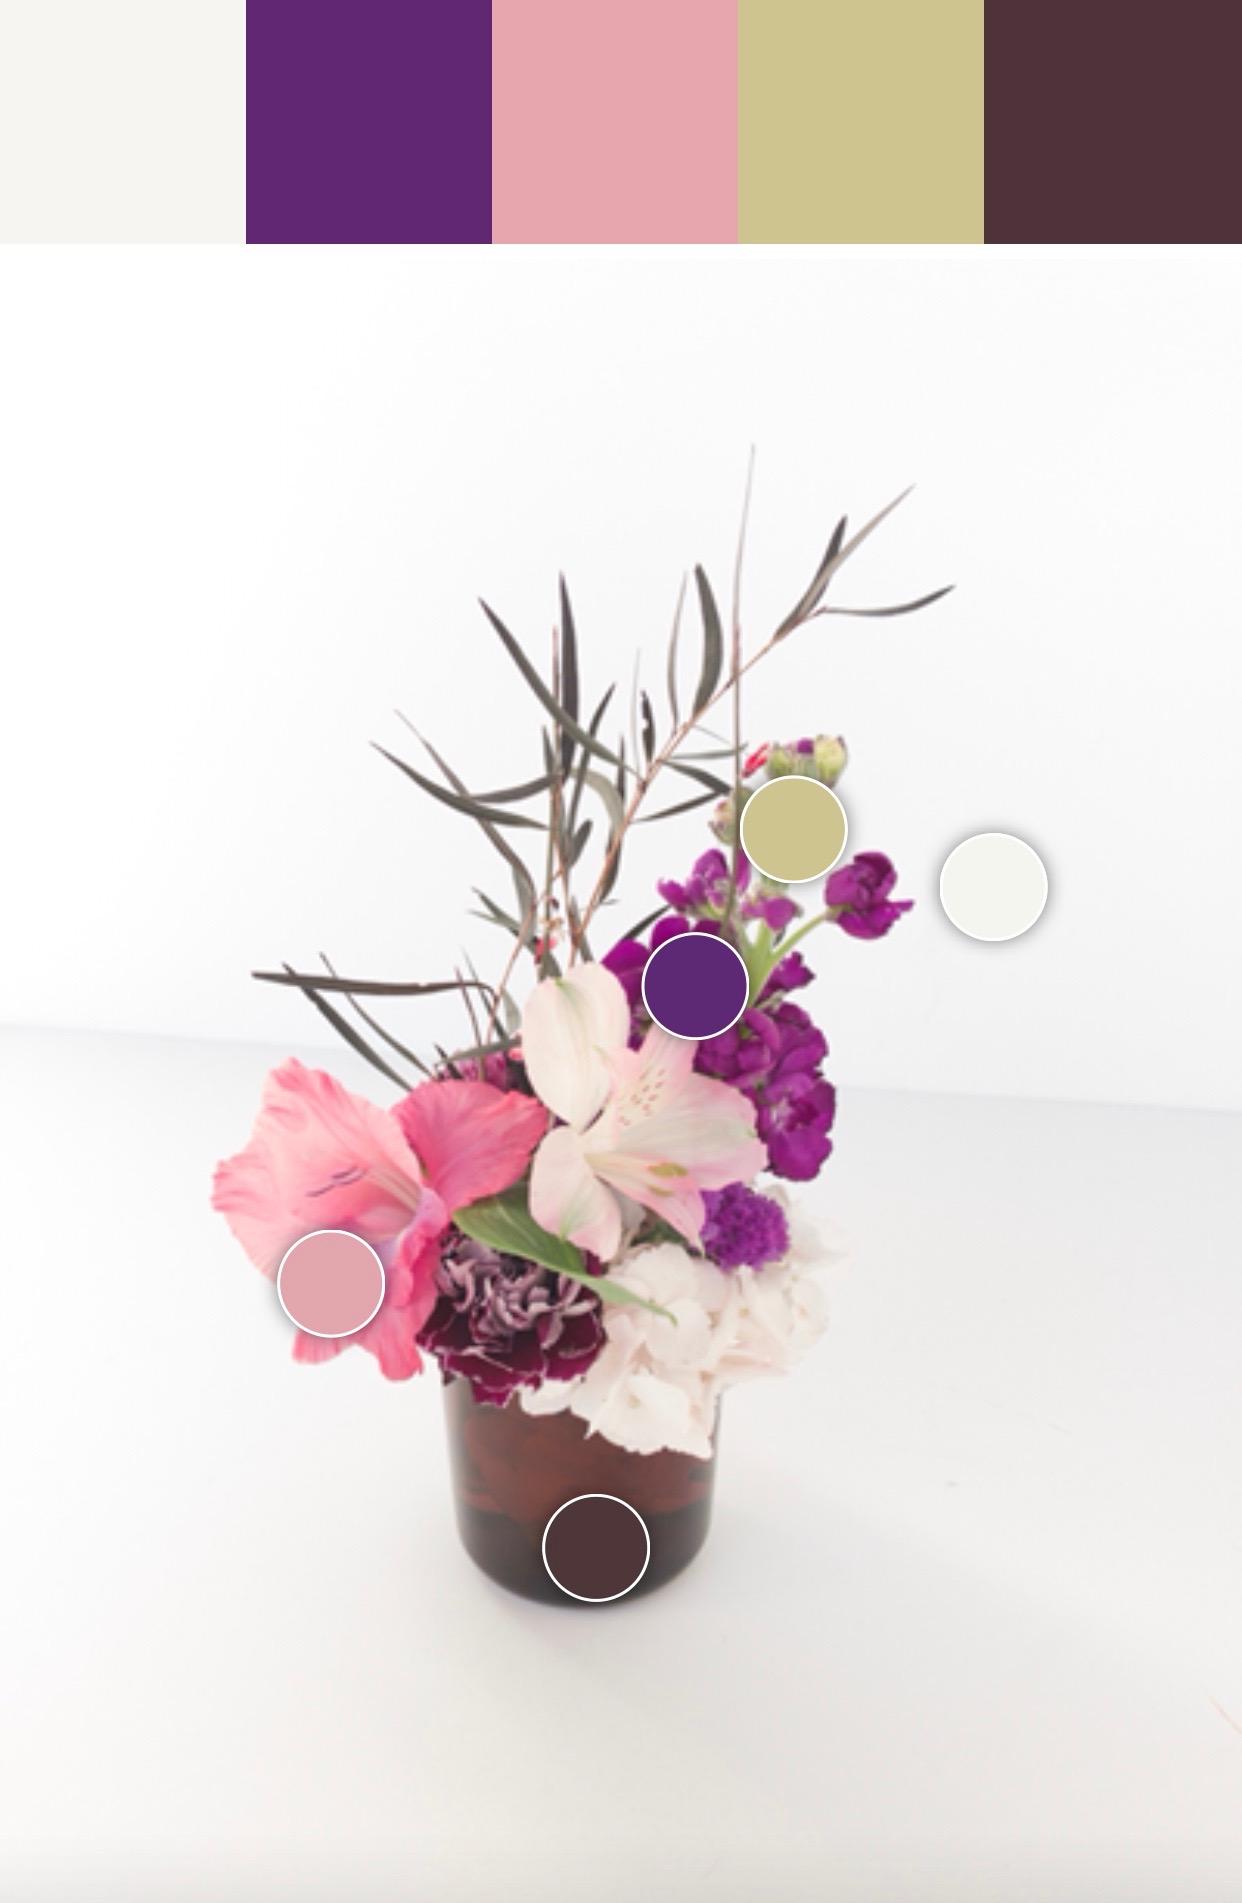 Petalfox Ultra Violet Floral Collection